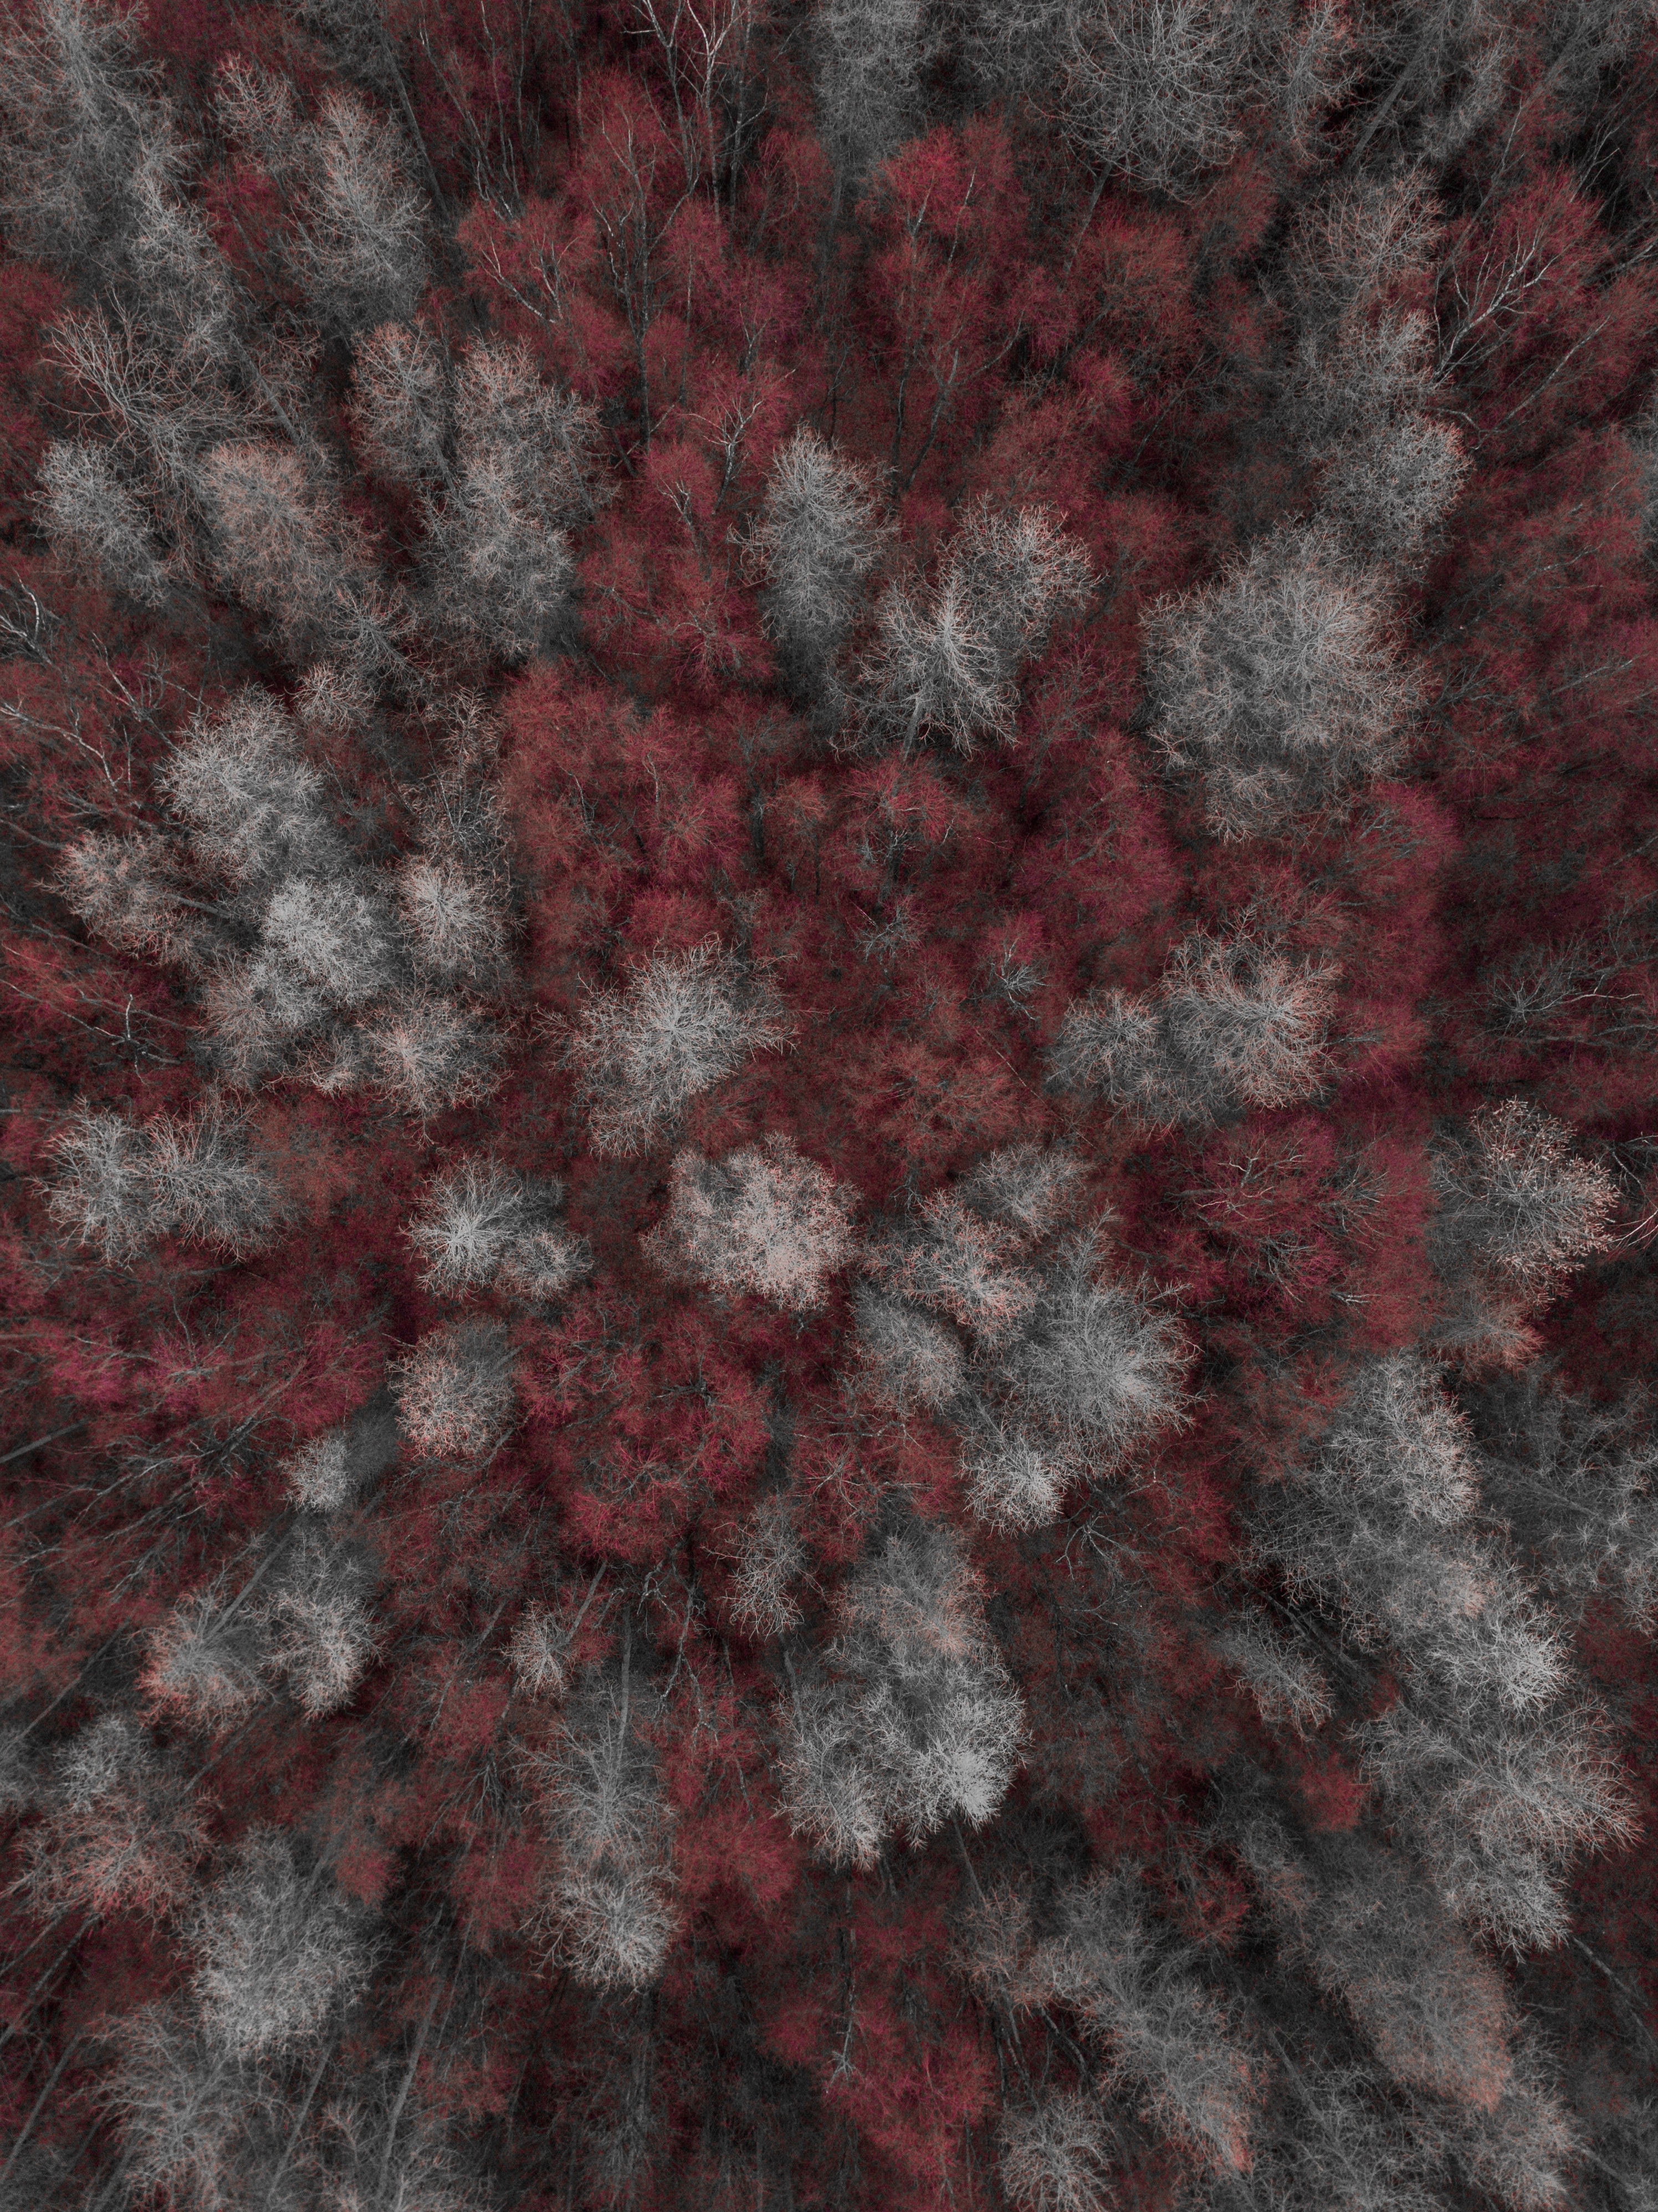 birds eye view of trees